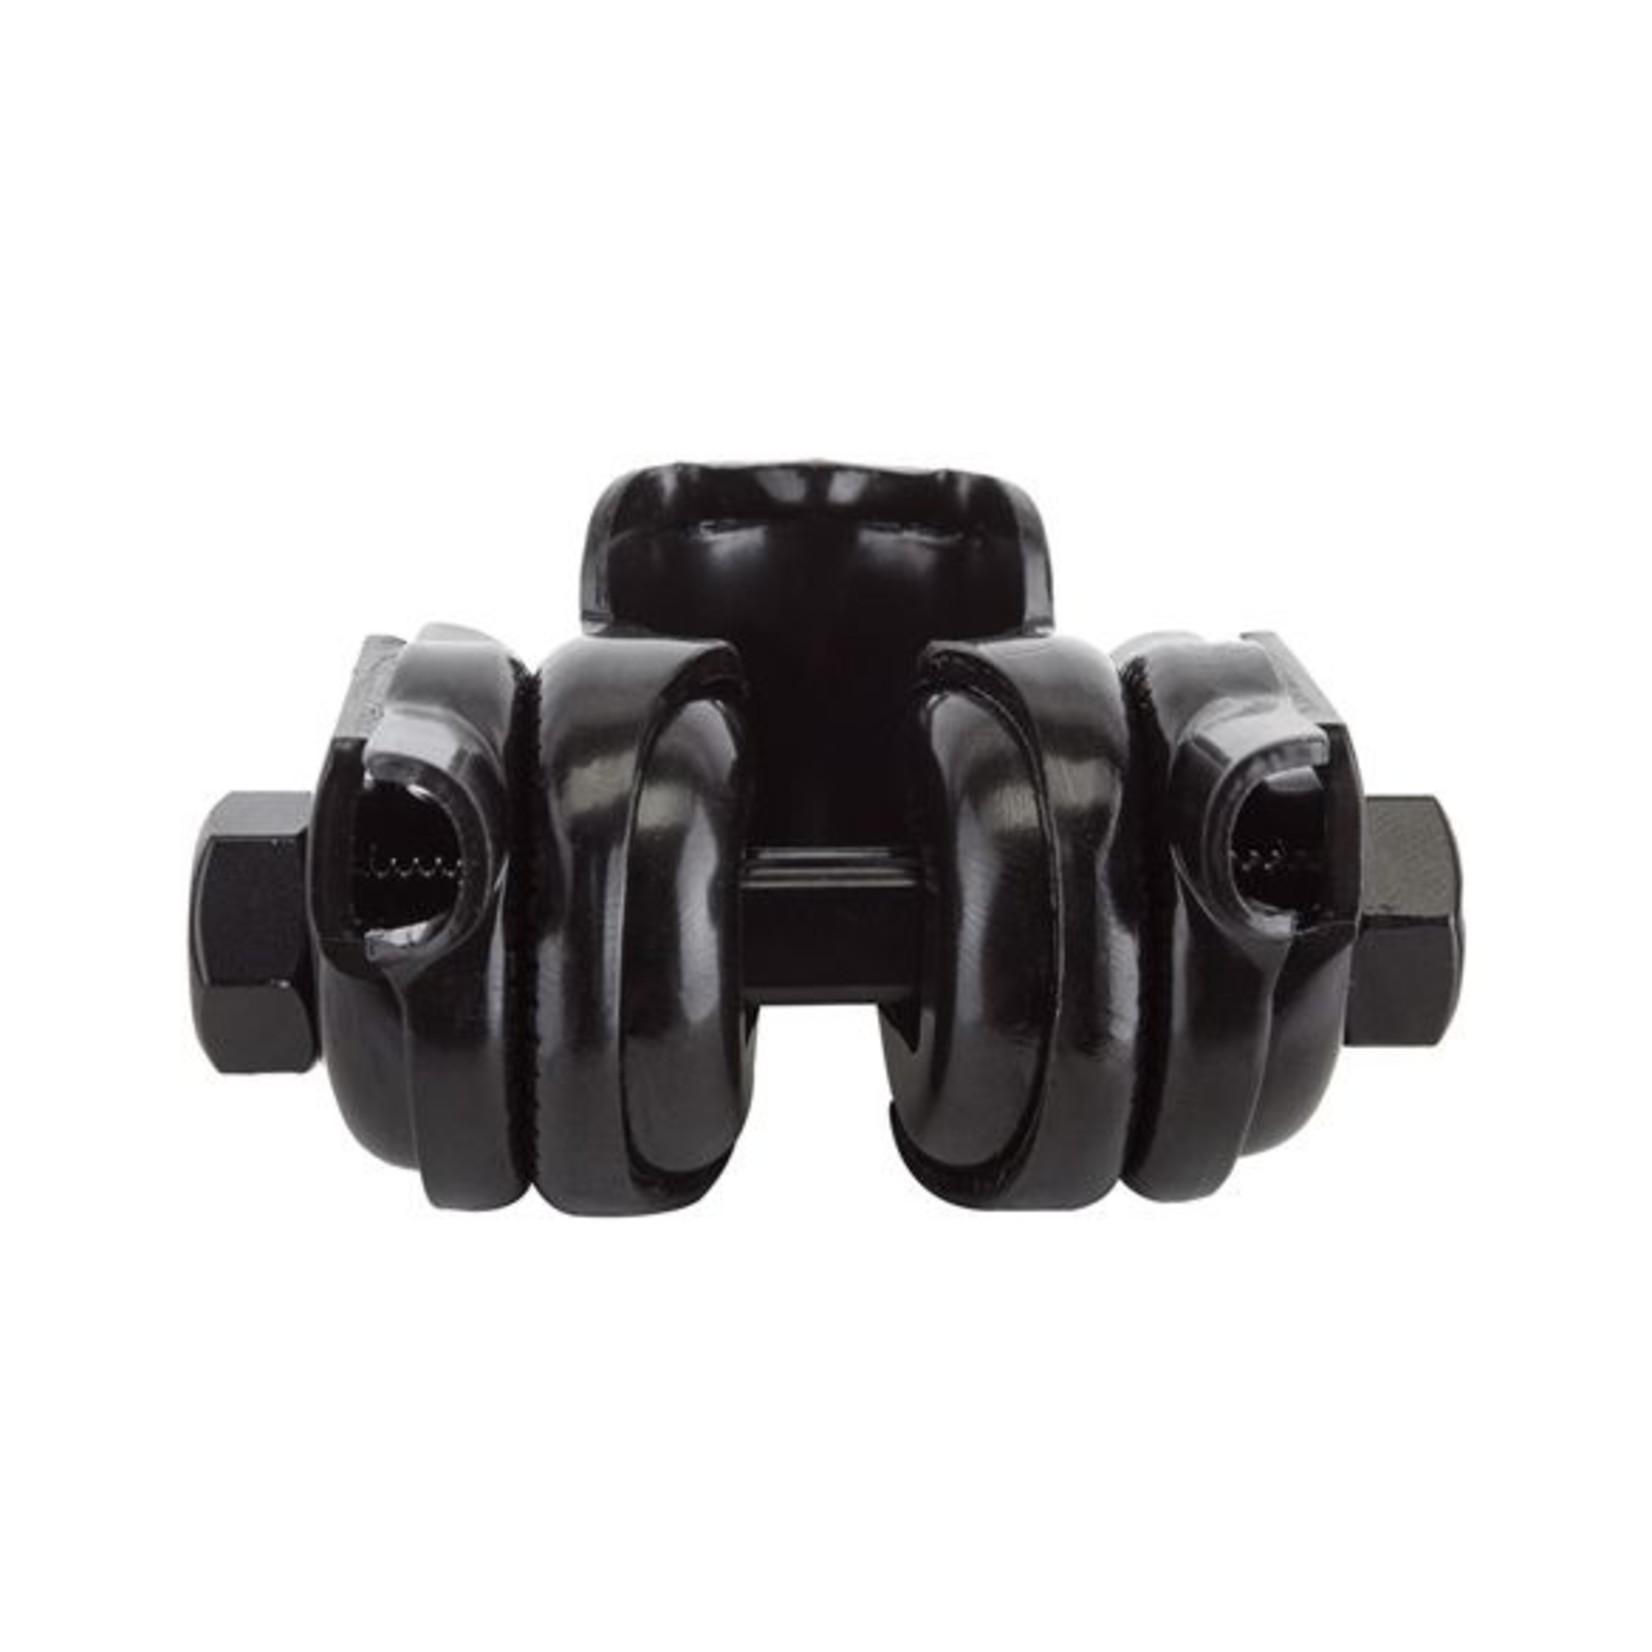 Sunlite Sunlt Rail Saddle Clamp Black